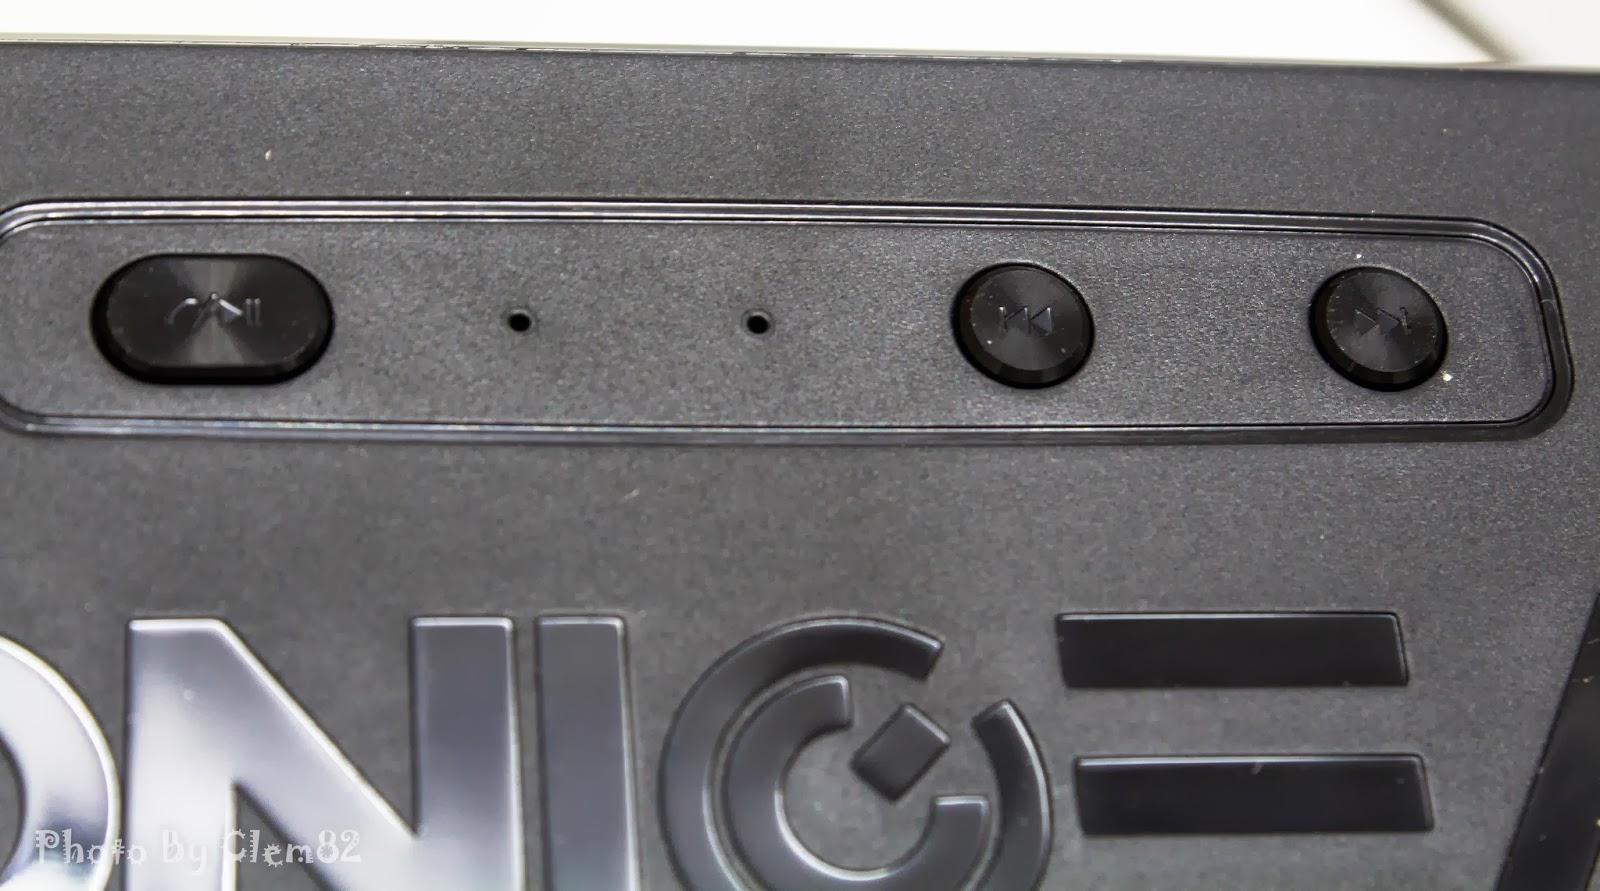 Opening Pandora's Box: SonicGear Pandora Wireless Bluetooth Media Player Series 27